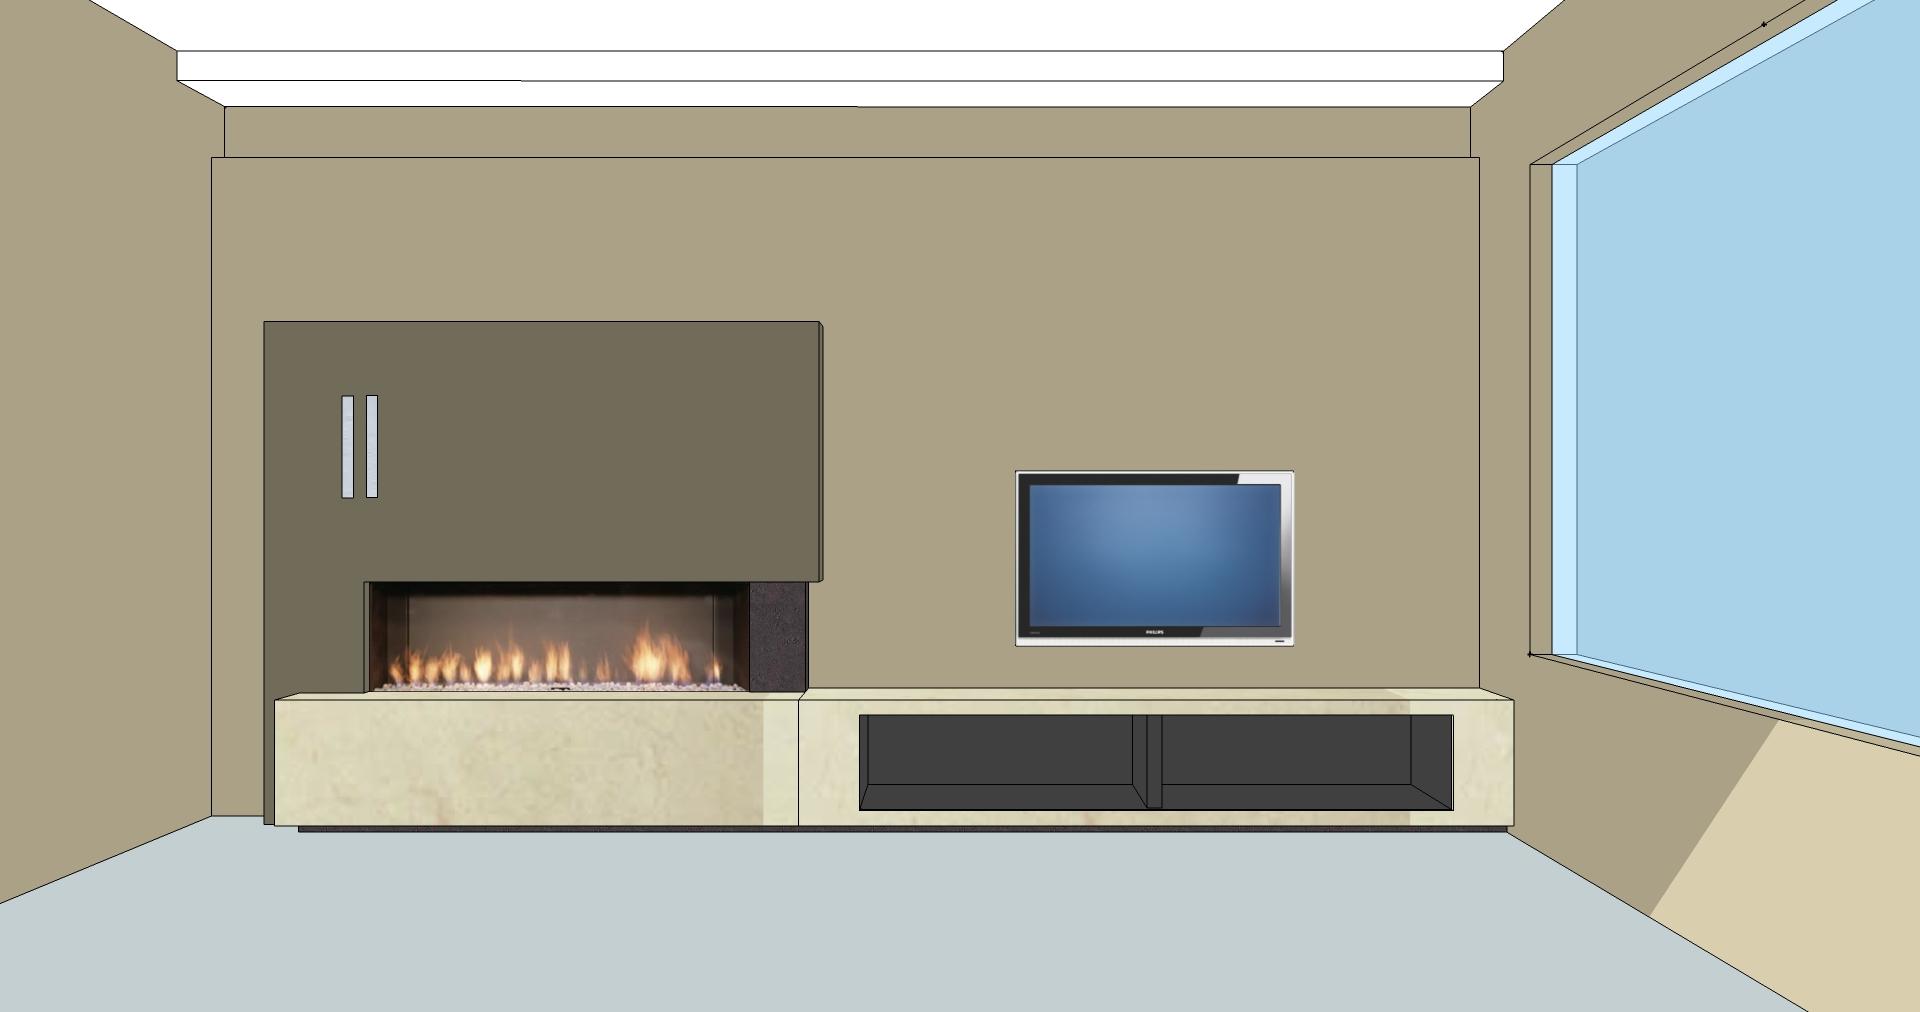 neijens - lozen website 1.jpg